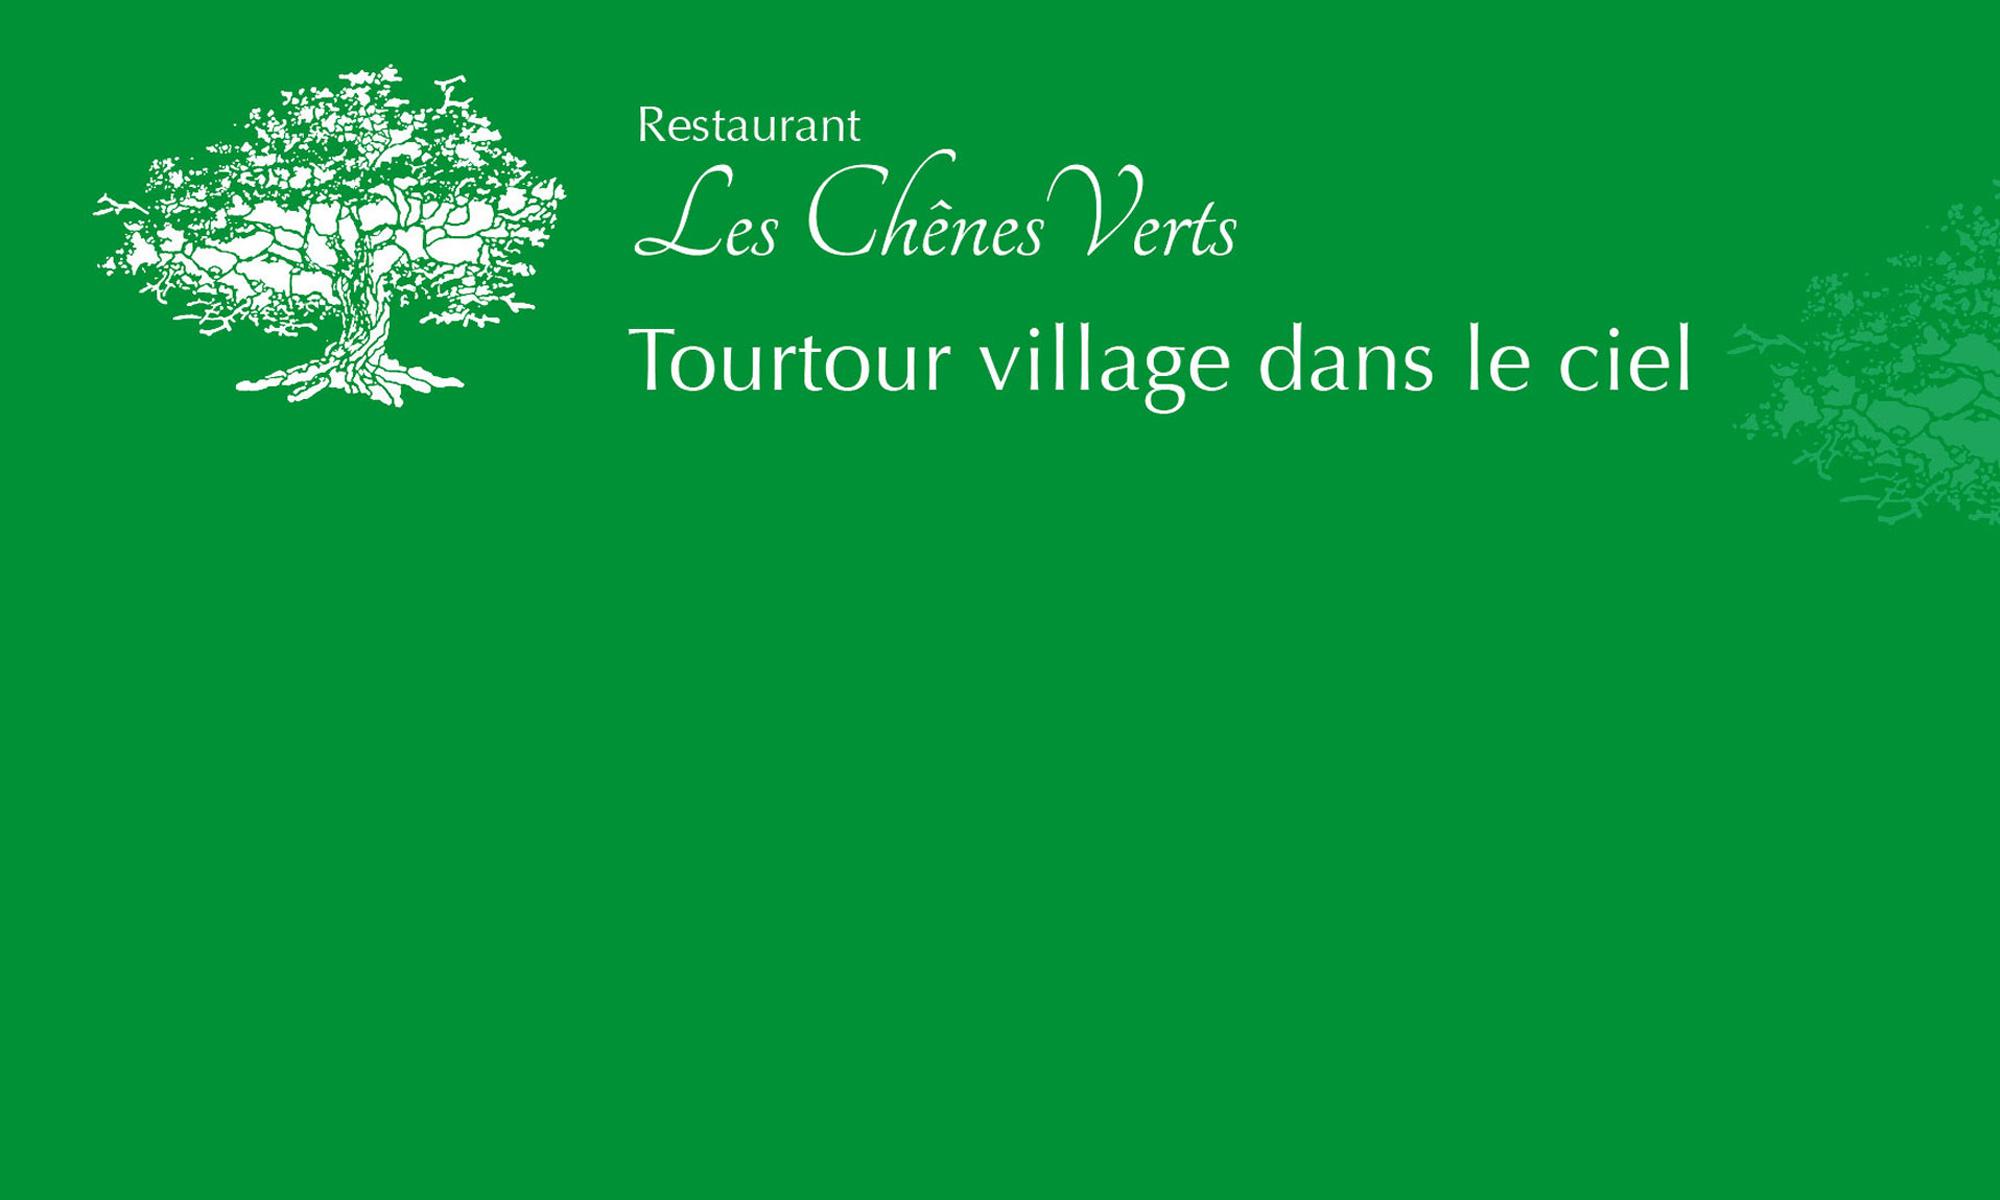 Restaurant les chênes vert